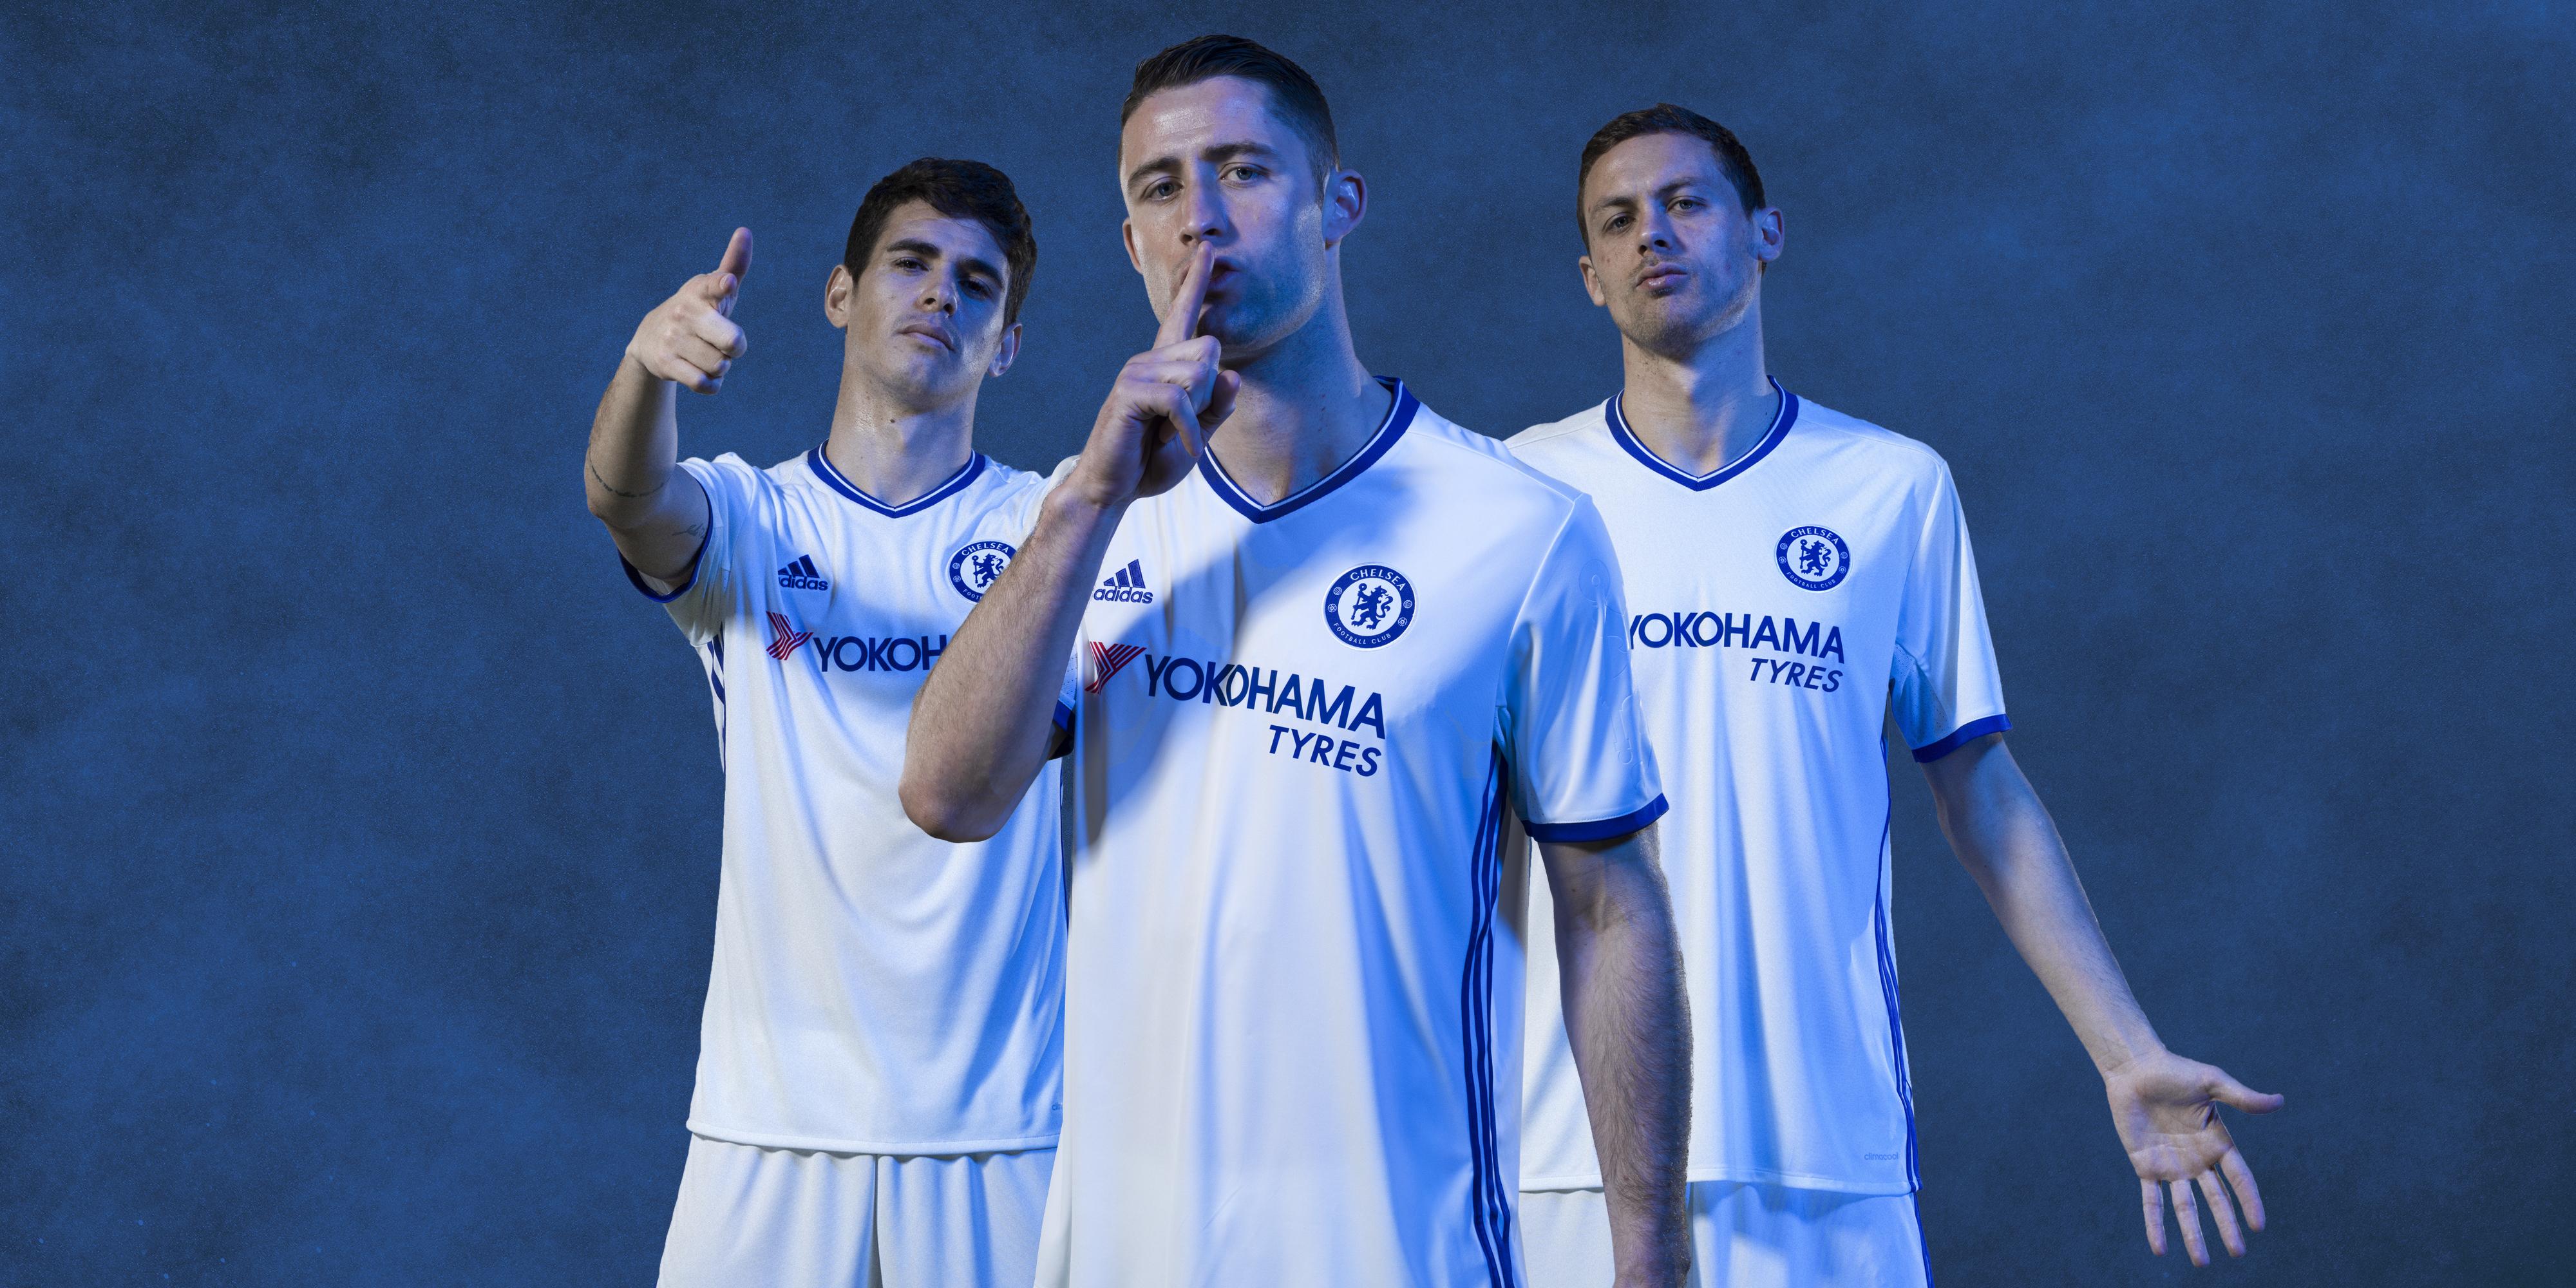 Chelsea_16-17_Third Kit_PR_GROUP